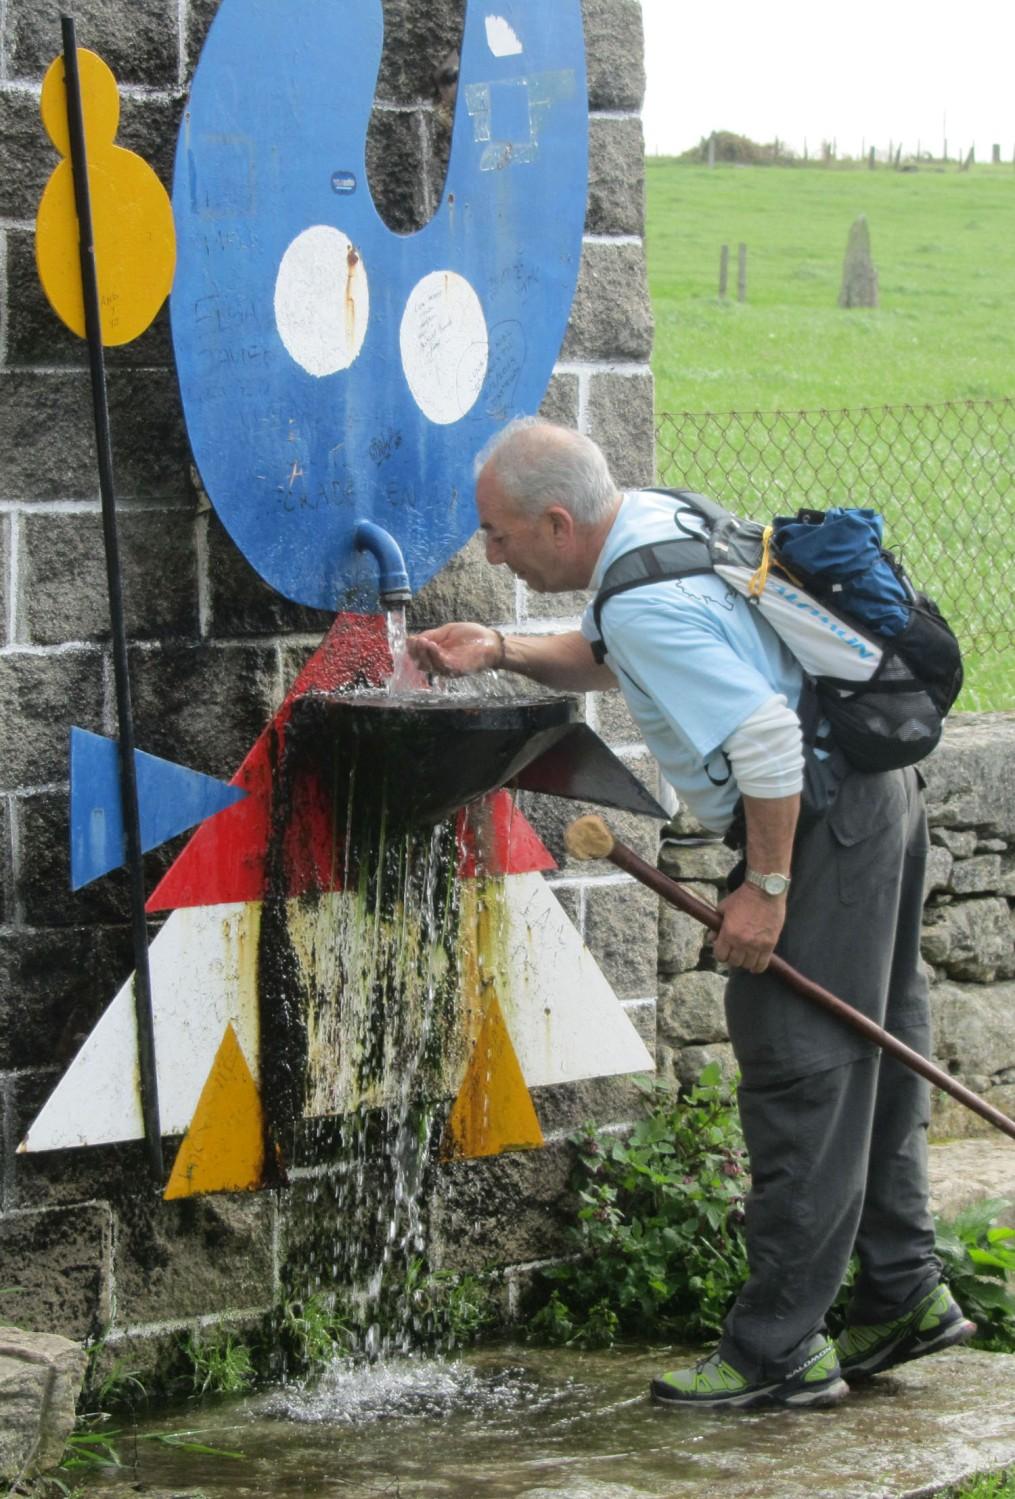 Camino-De-Santiago-Sights-And-Scenery-Water-Fountain